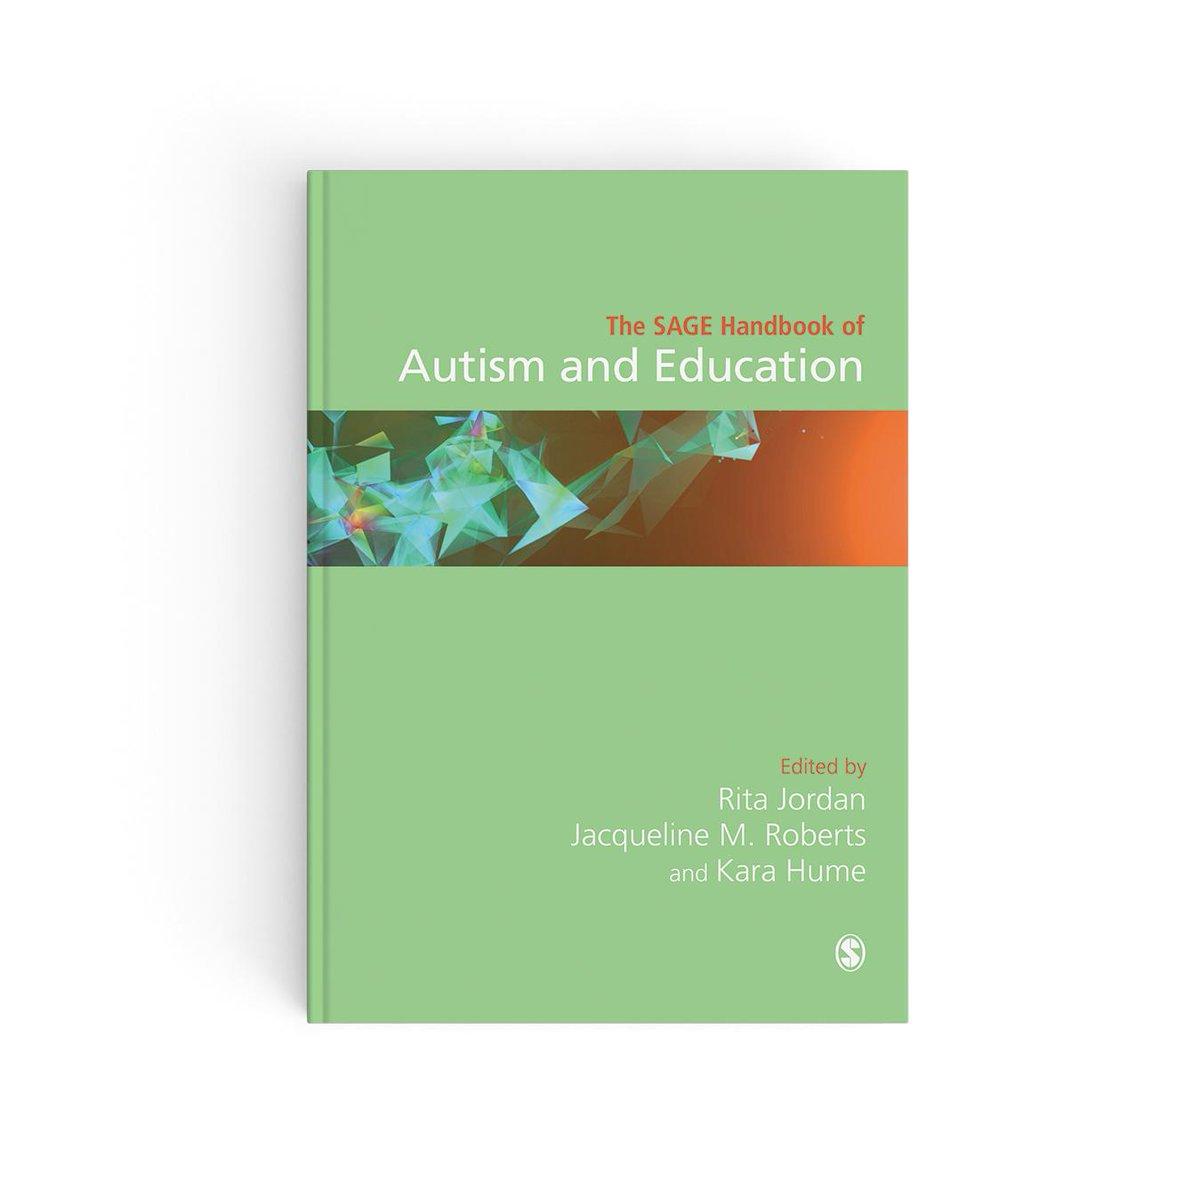 book Sozialer Abstieg und Konsum: Auswirkungen finanzieller Verknappung